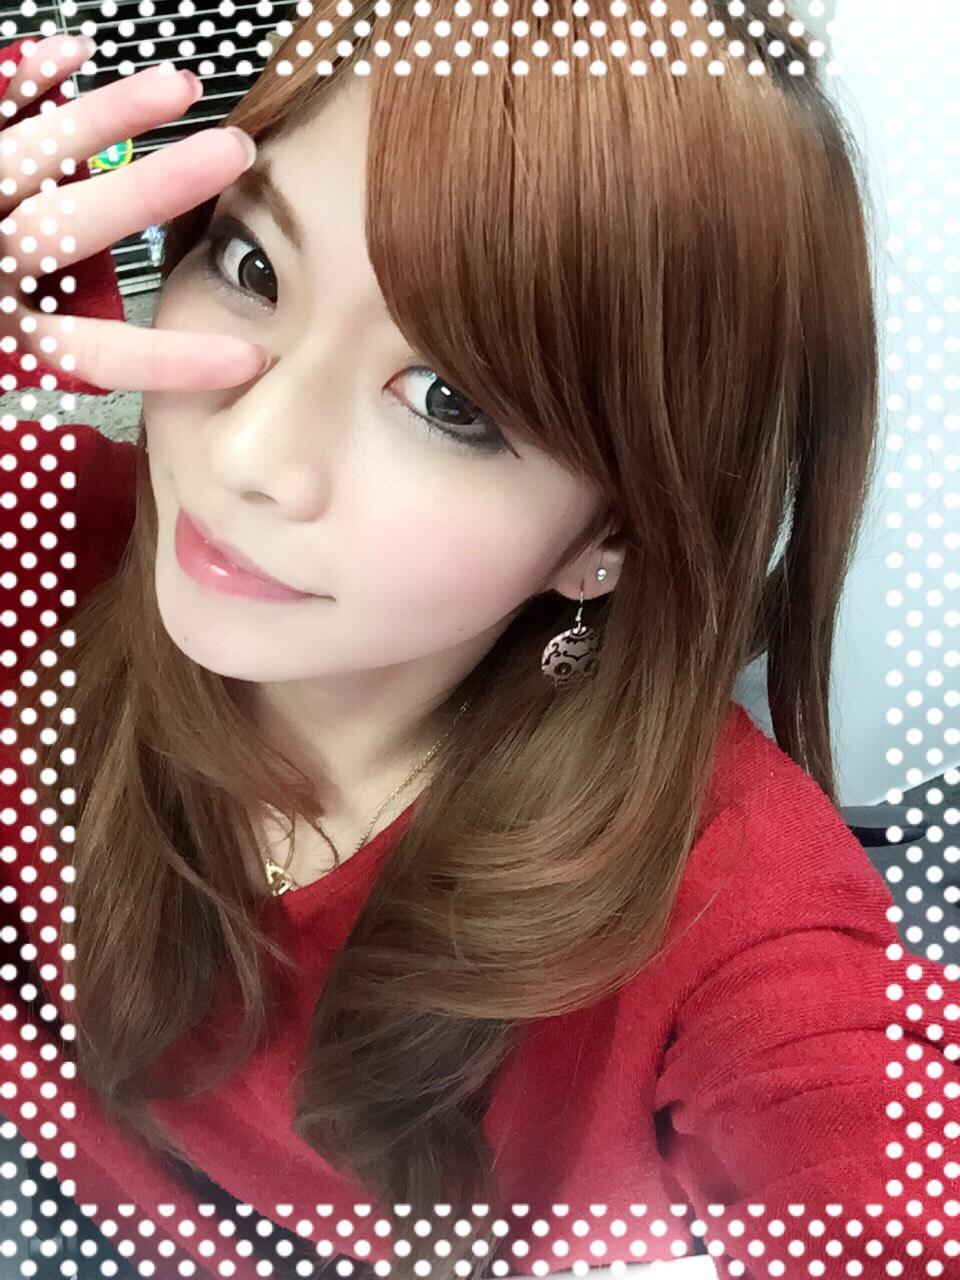 S__5816322.jpg